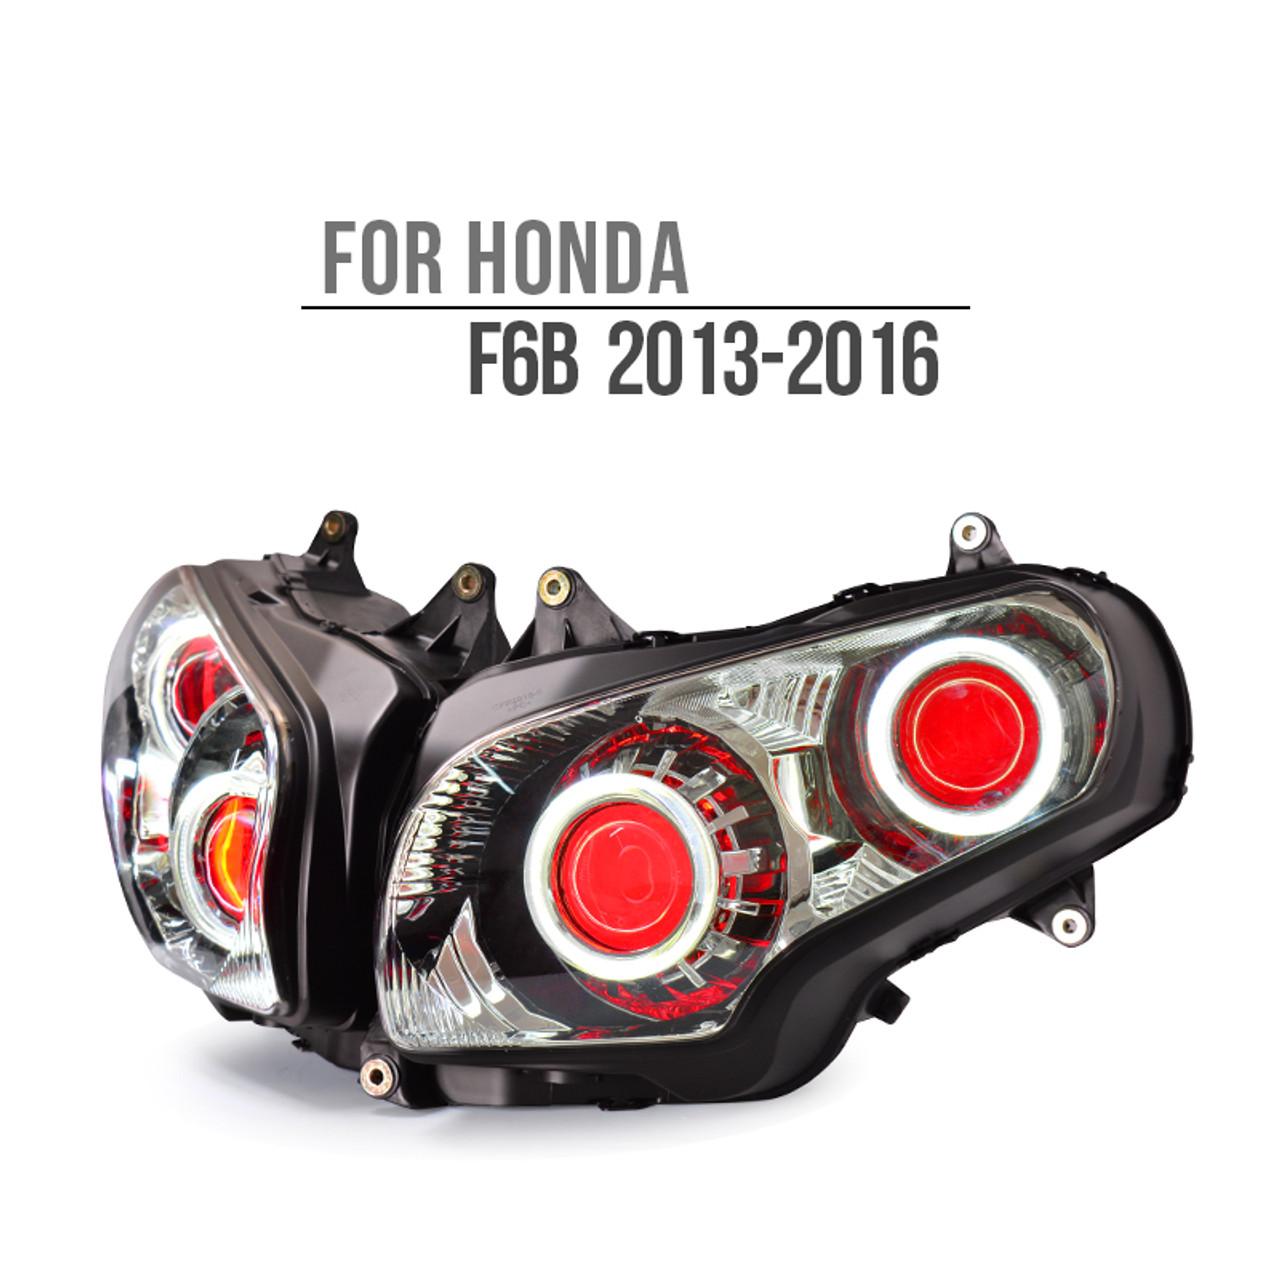 2016 Honda Goldwing >> Fit For Honda Goldwing F6b 2013 2016 Kt Led Angel Eye Headlight Assembly